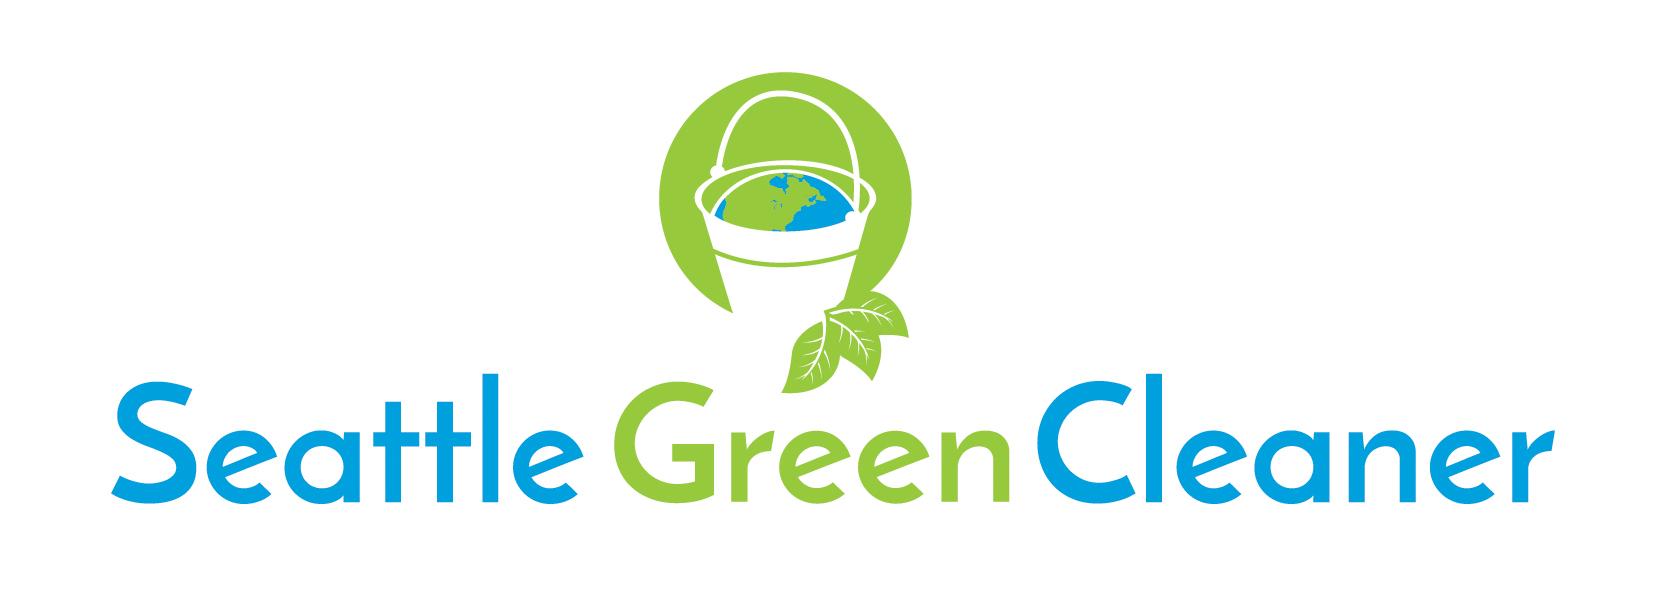 Seattle Green Cleaner logo